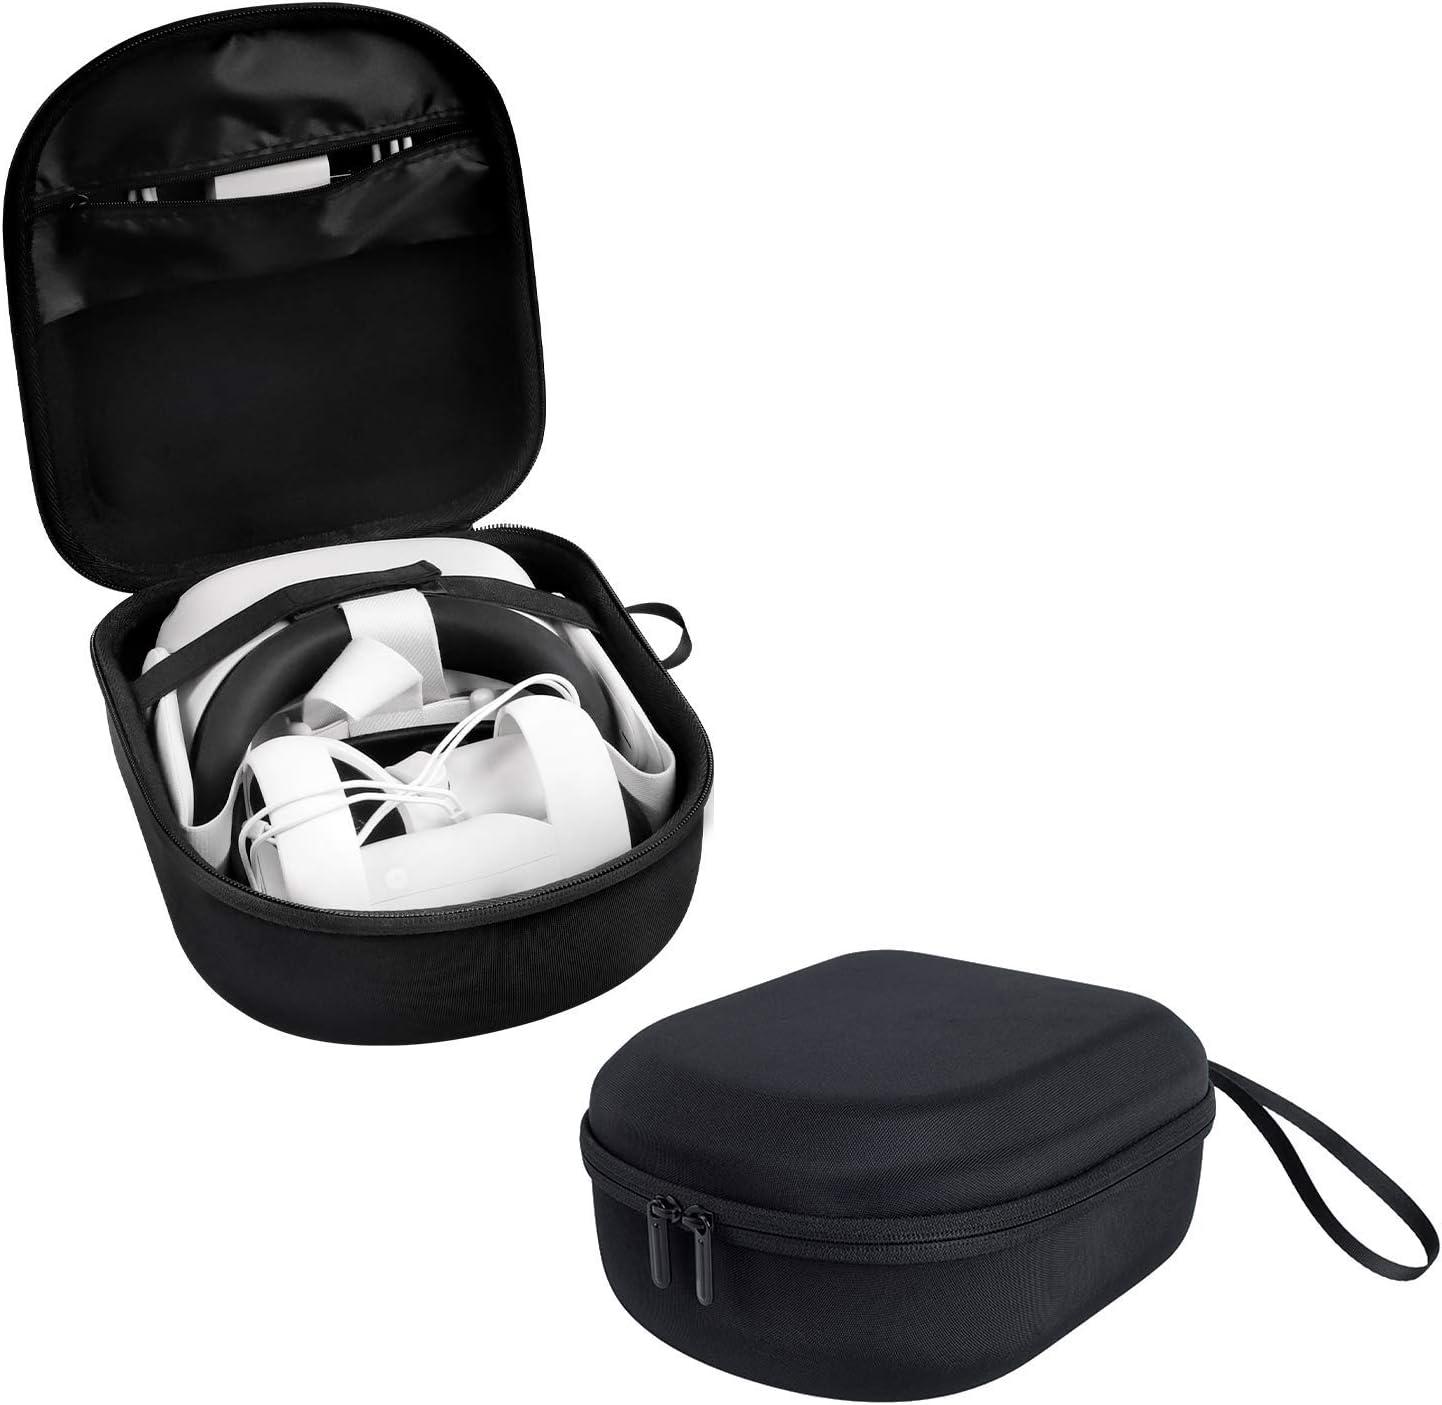 Oculus Sales Regular discount Quest 2 Carryi Accessories Case